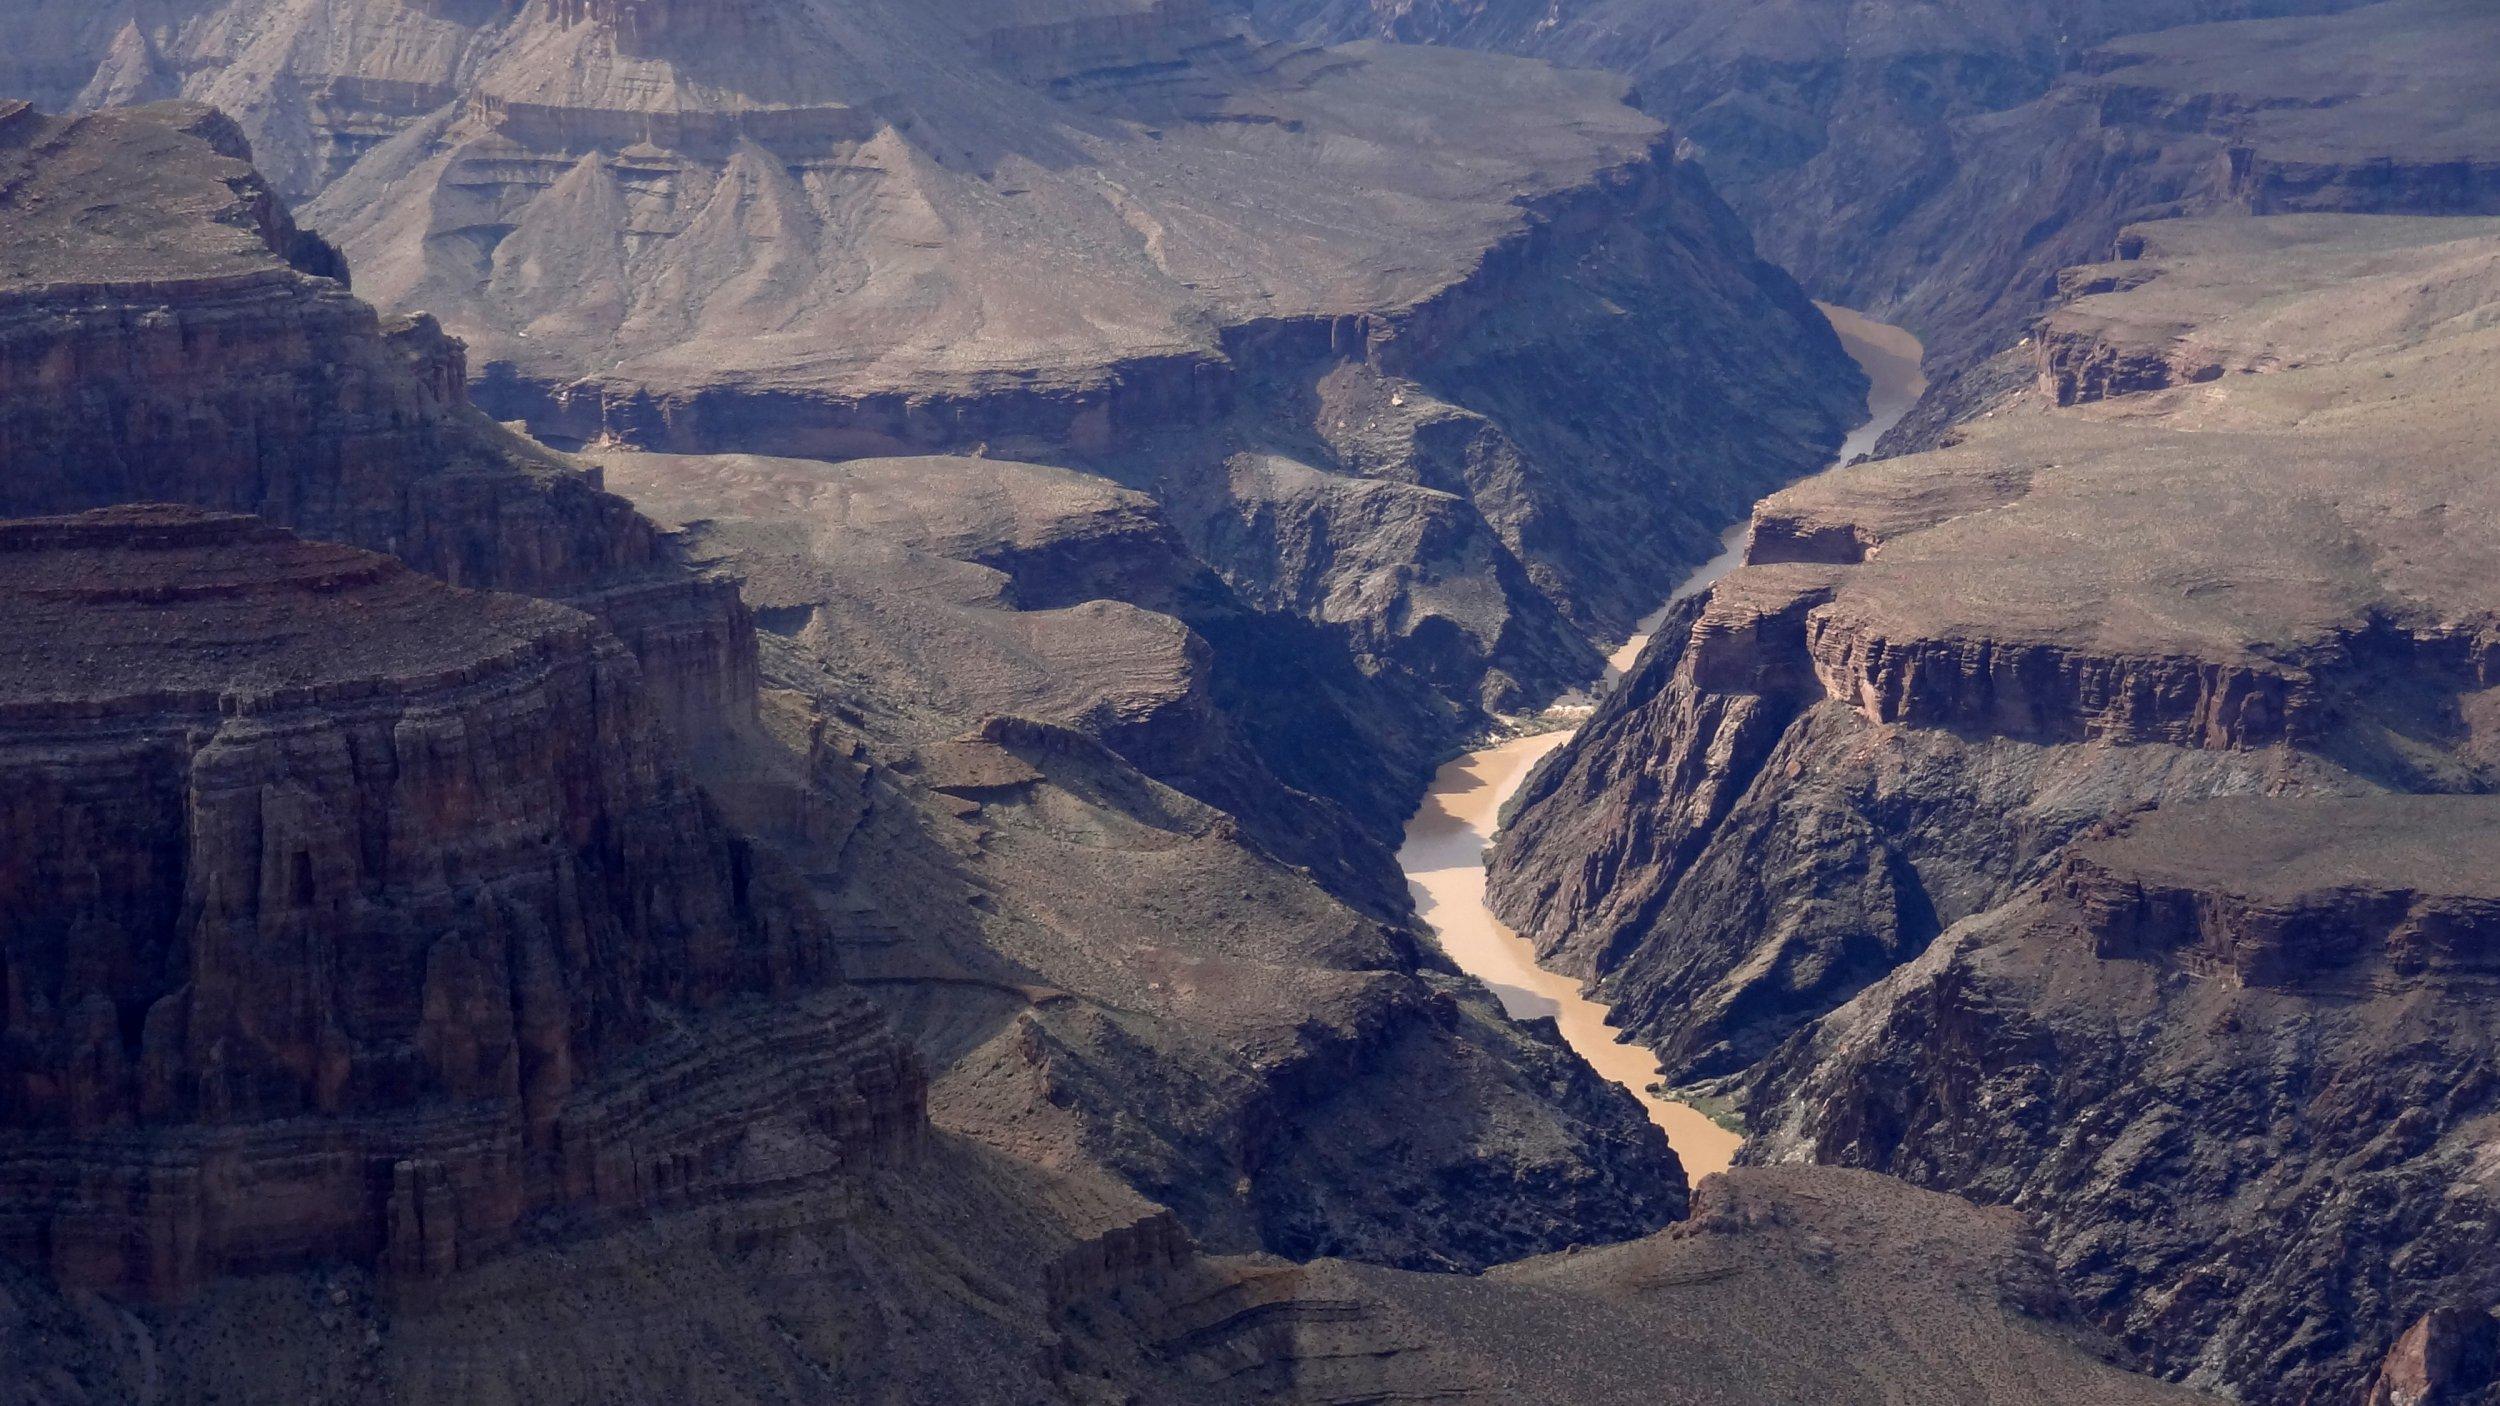 8-25-15 Grand Canyon